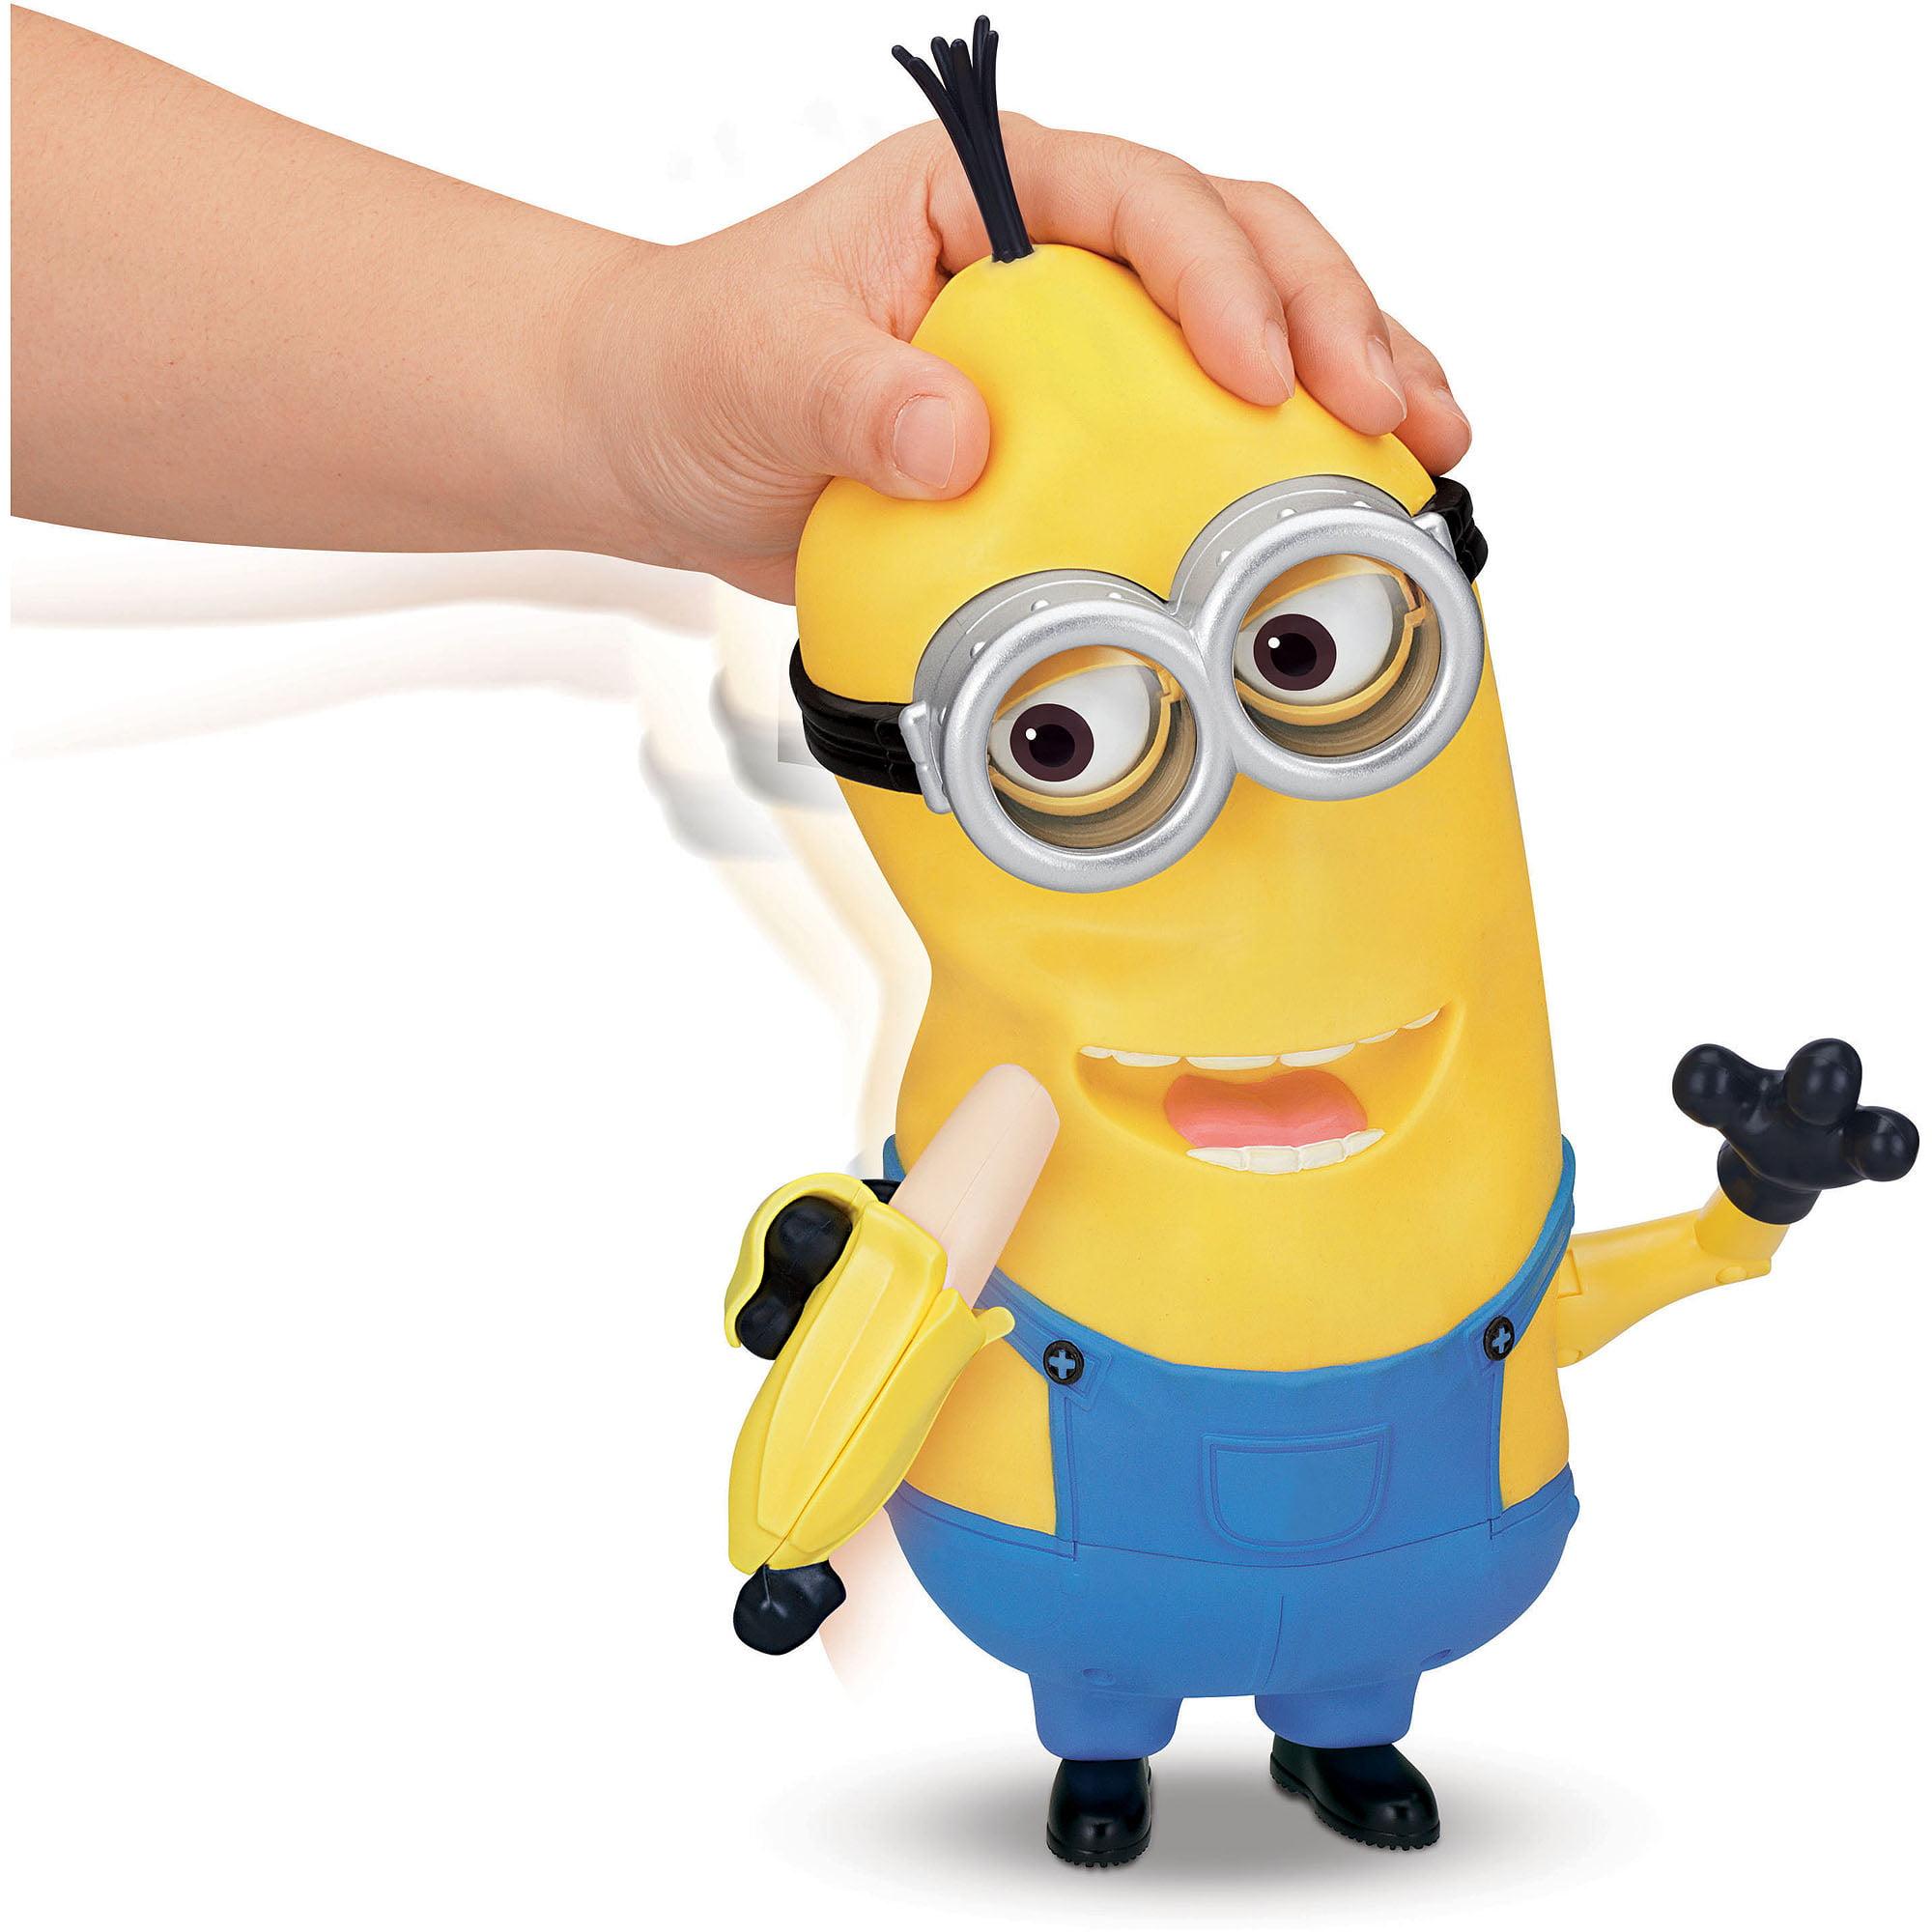 Minion Kevin Banana Eating Action Figure   Walmart.com